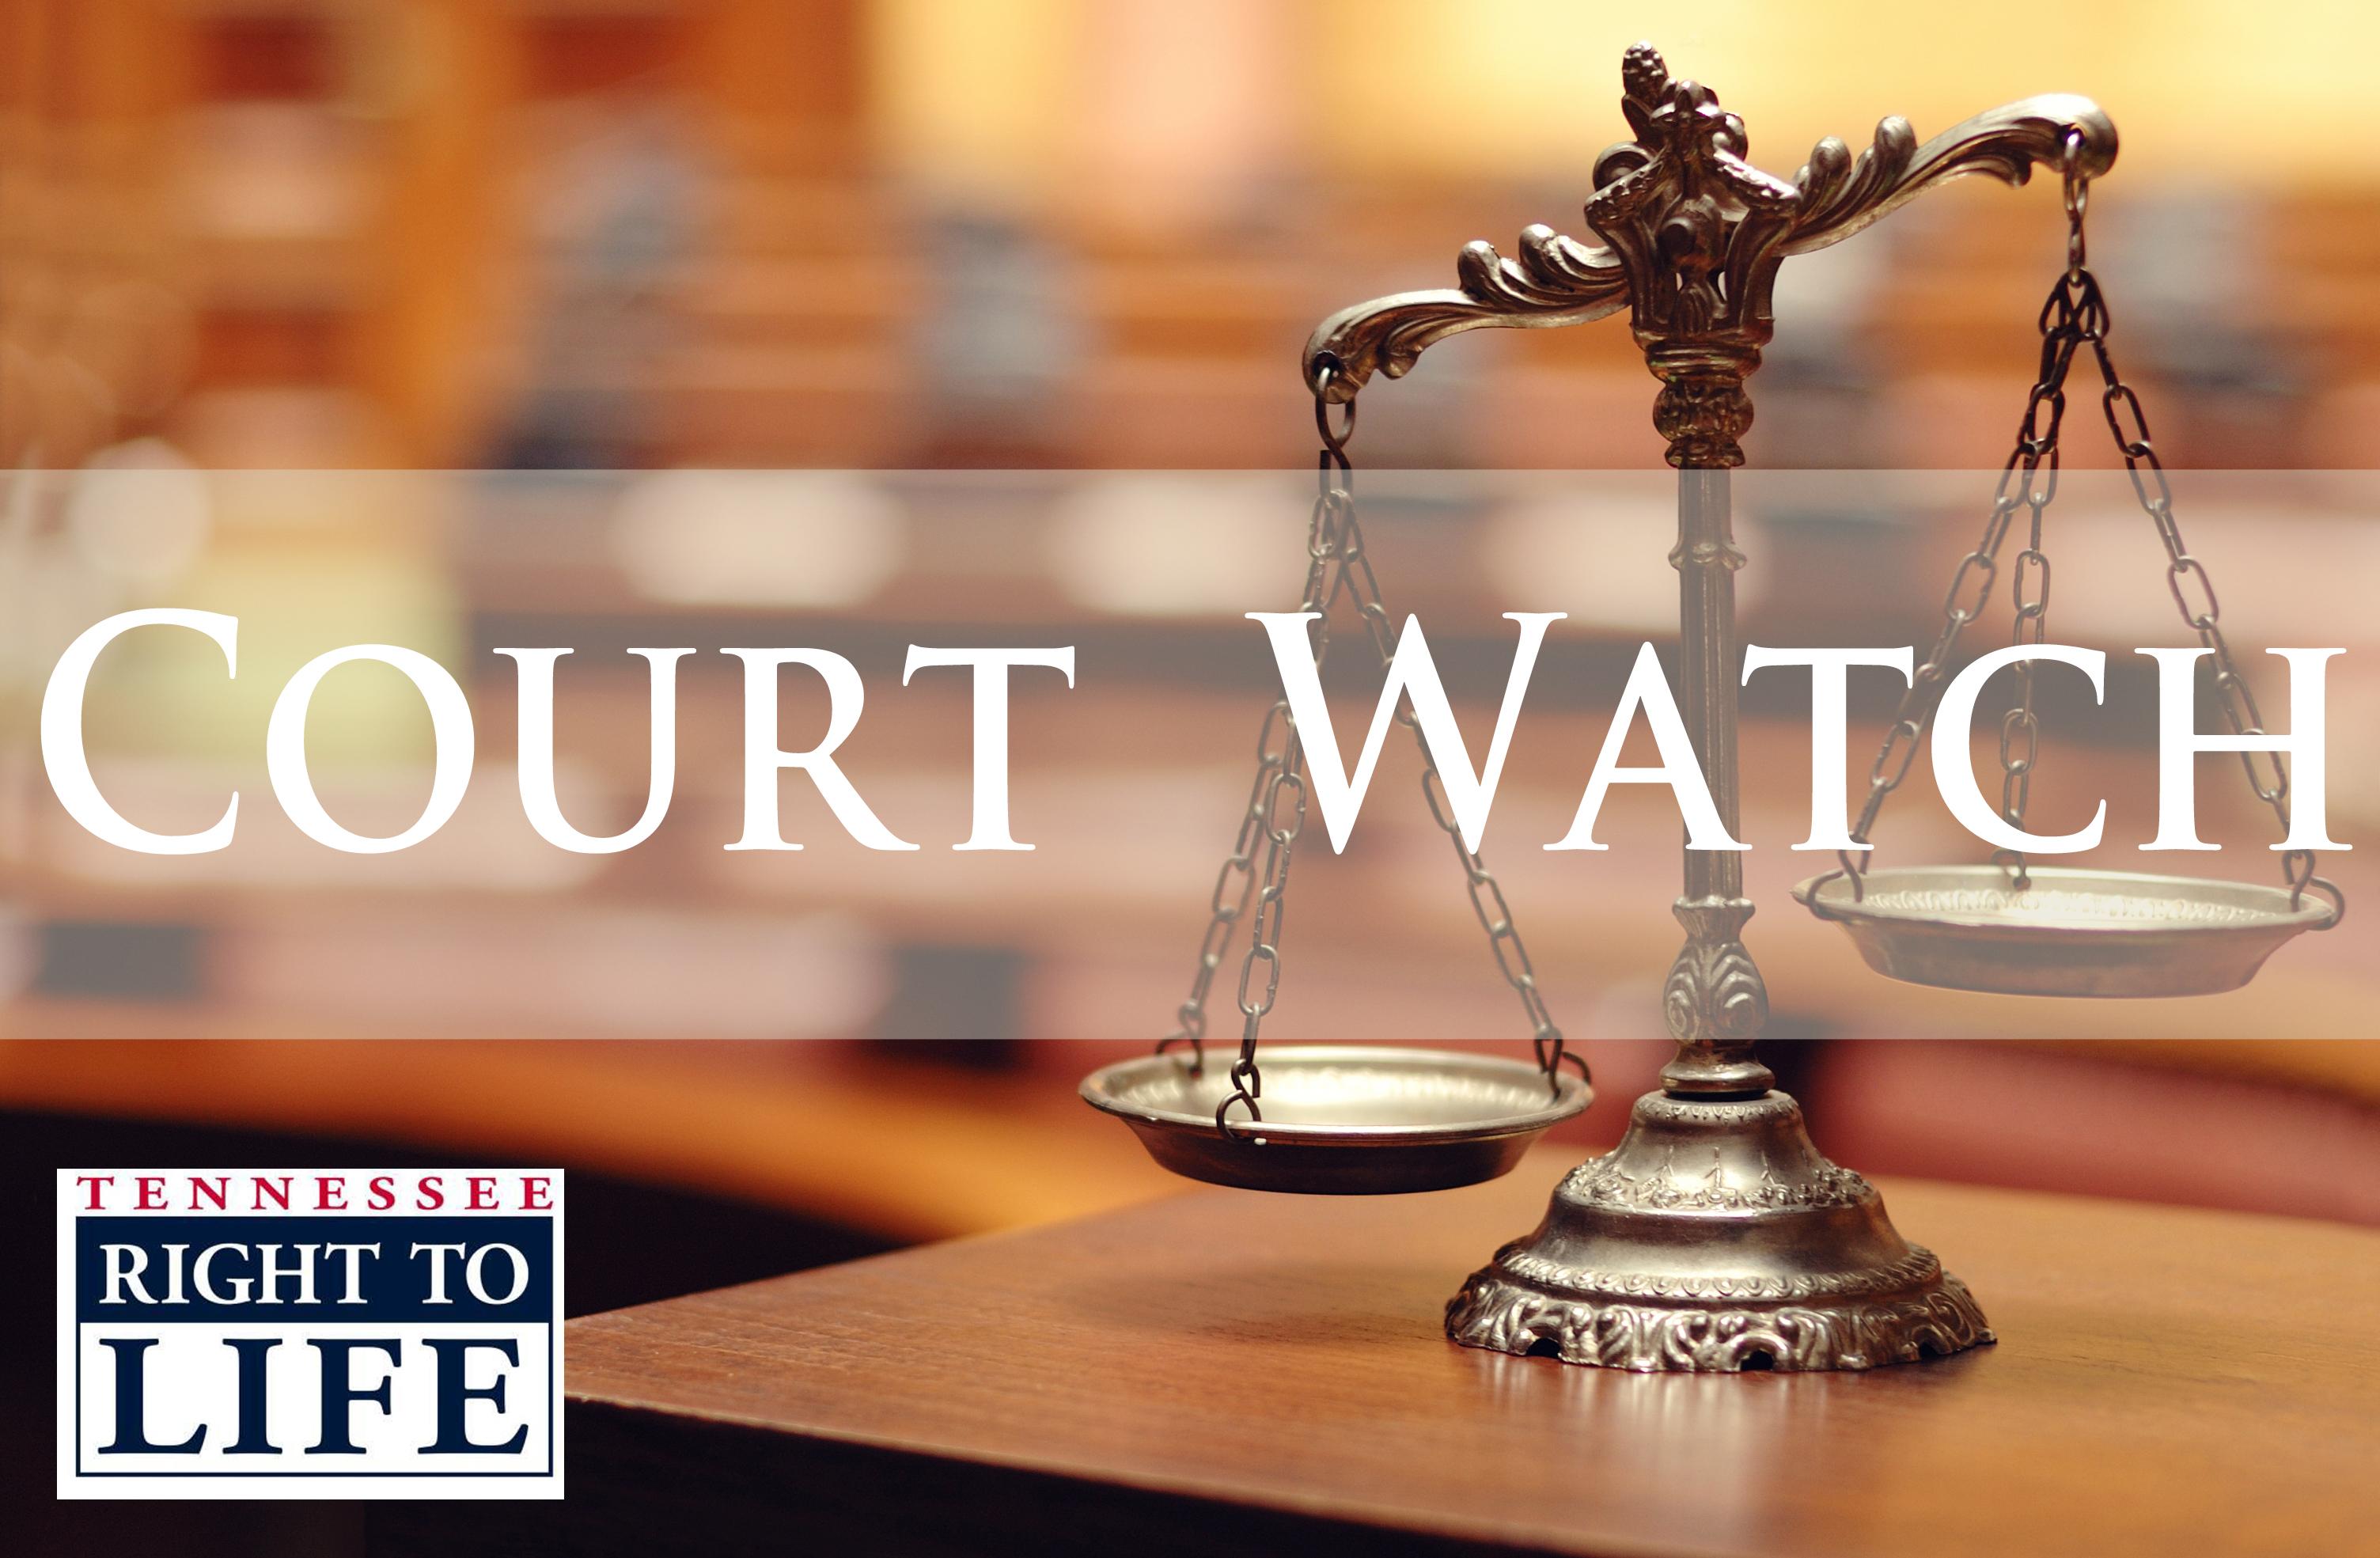 Court_Watch_Meme.jpg